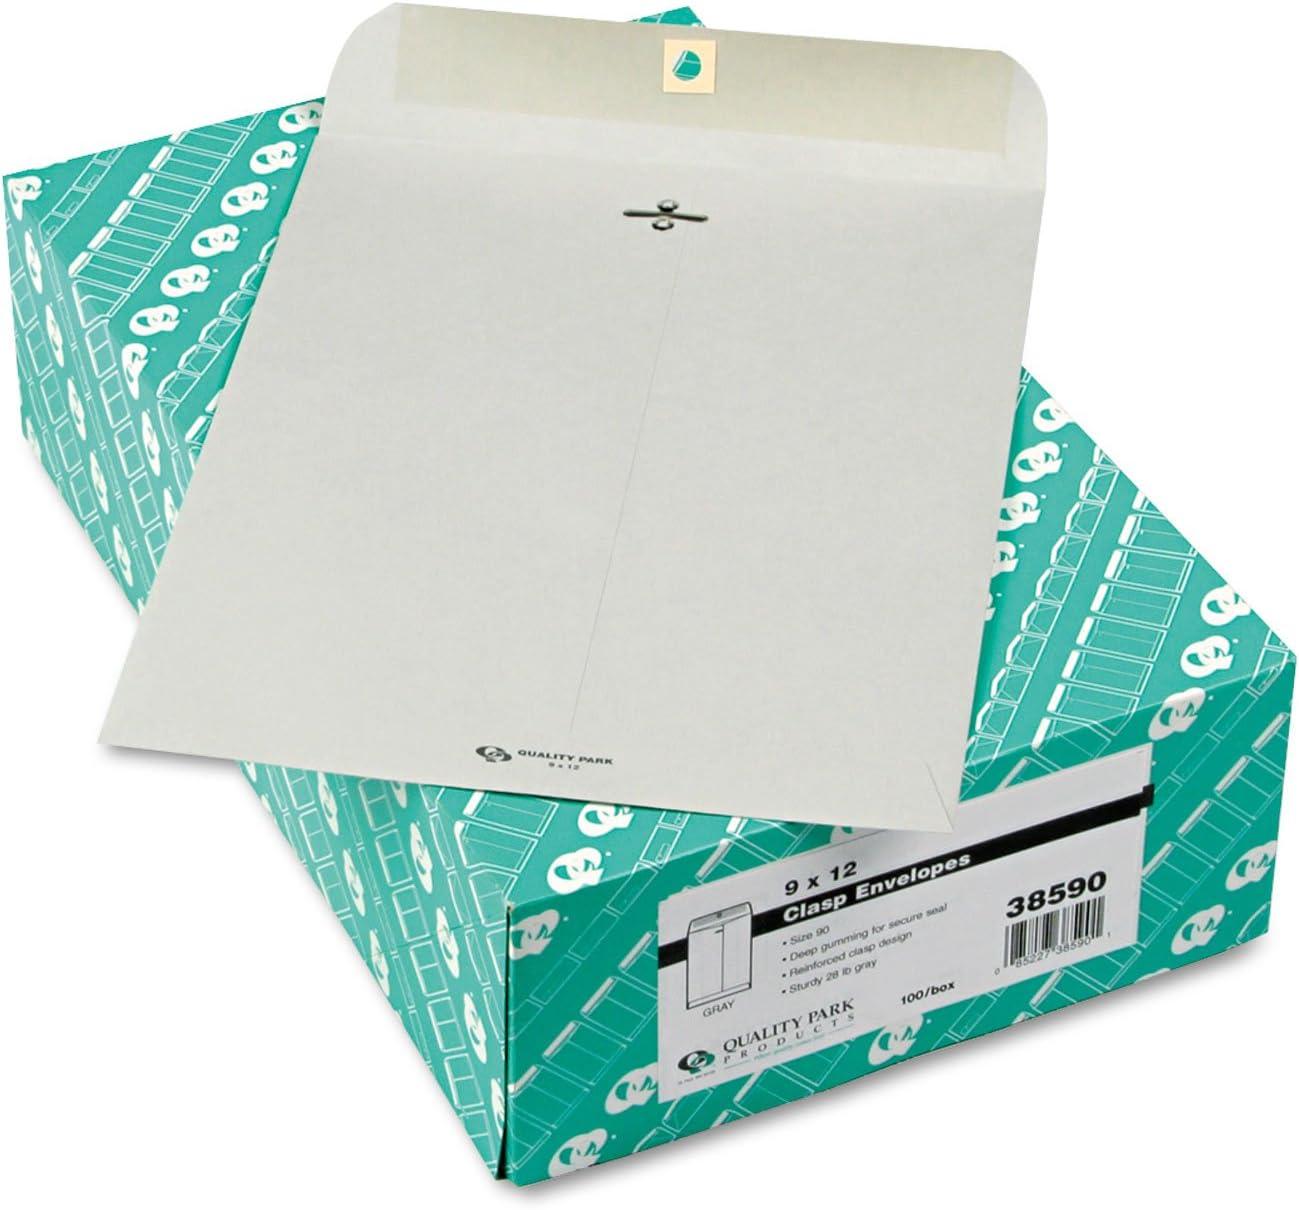 QUA38590 Gummed Clasp Envelope 28Lb 100 Superlatite In stock 9x12 Gray BX